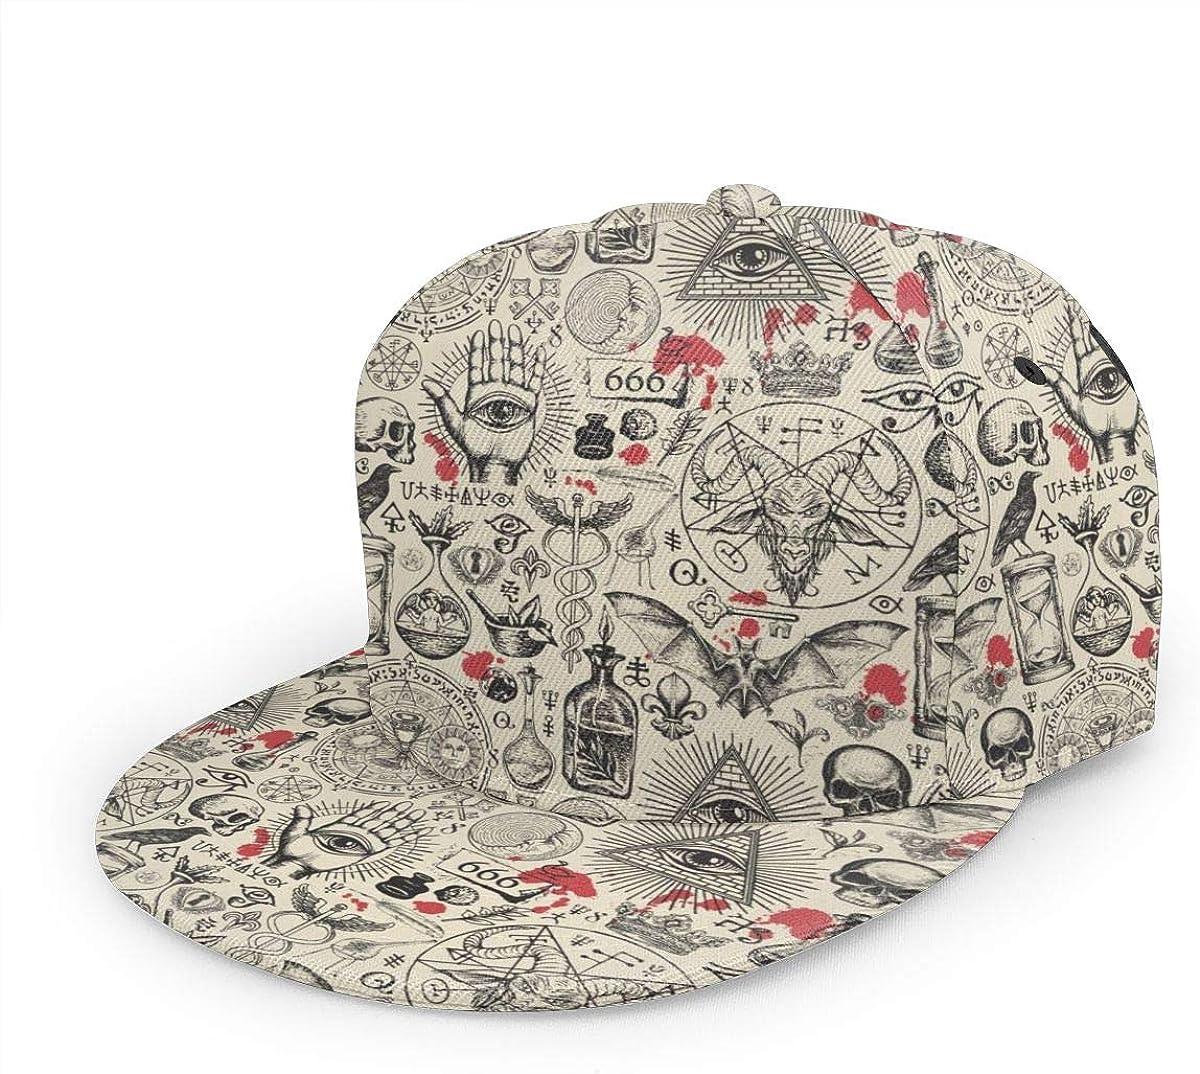 antkondnm Abstract Pattern On Occult Theme Flat Bill Brim Cap, Cool Hip Hop Trucker Hat Men Women Adjustable Baseball Caps